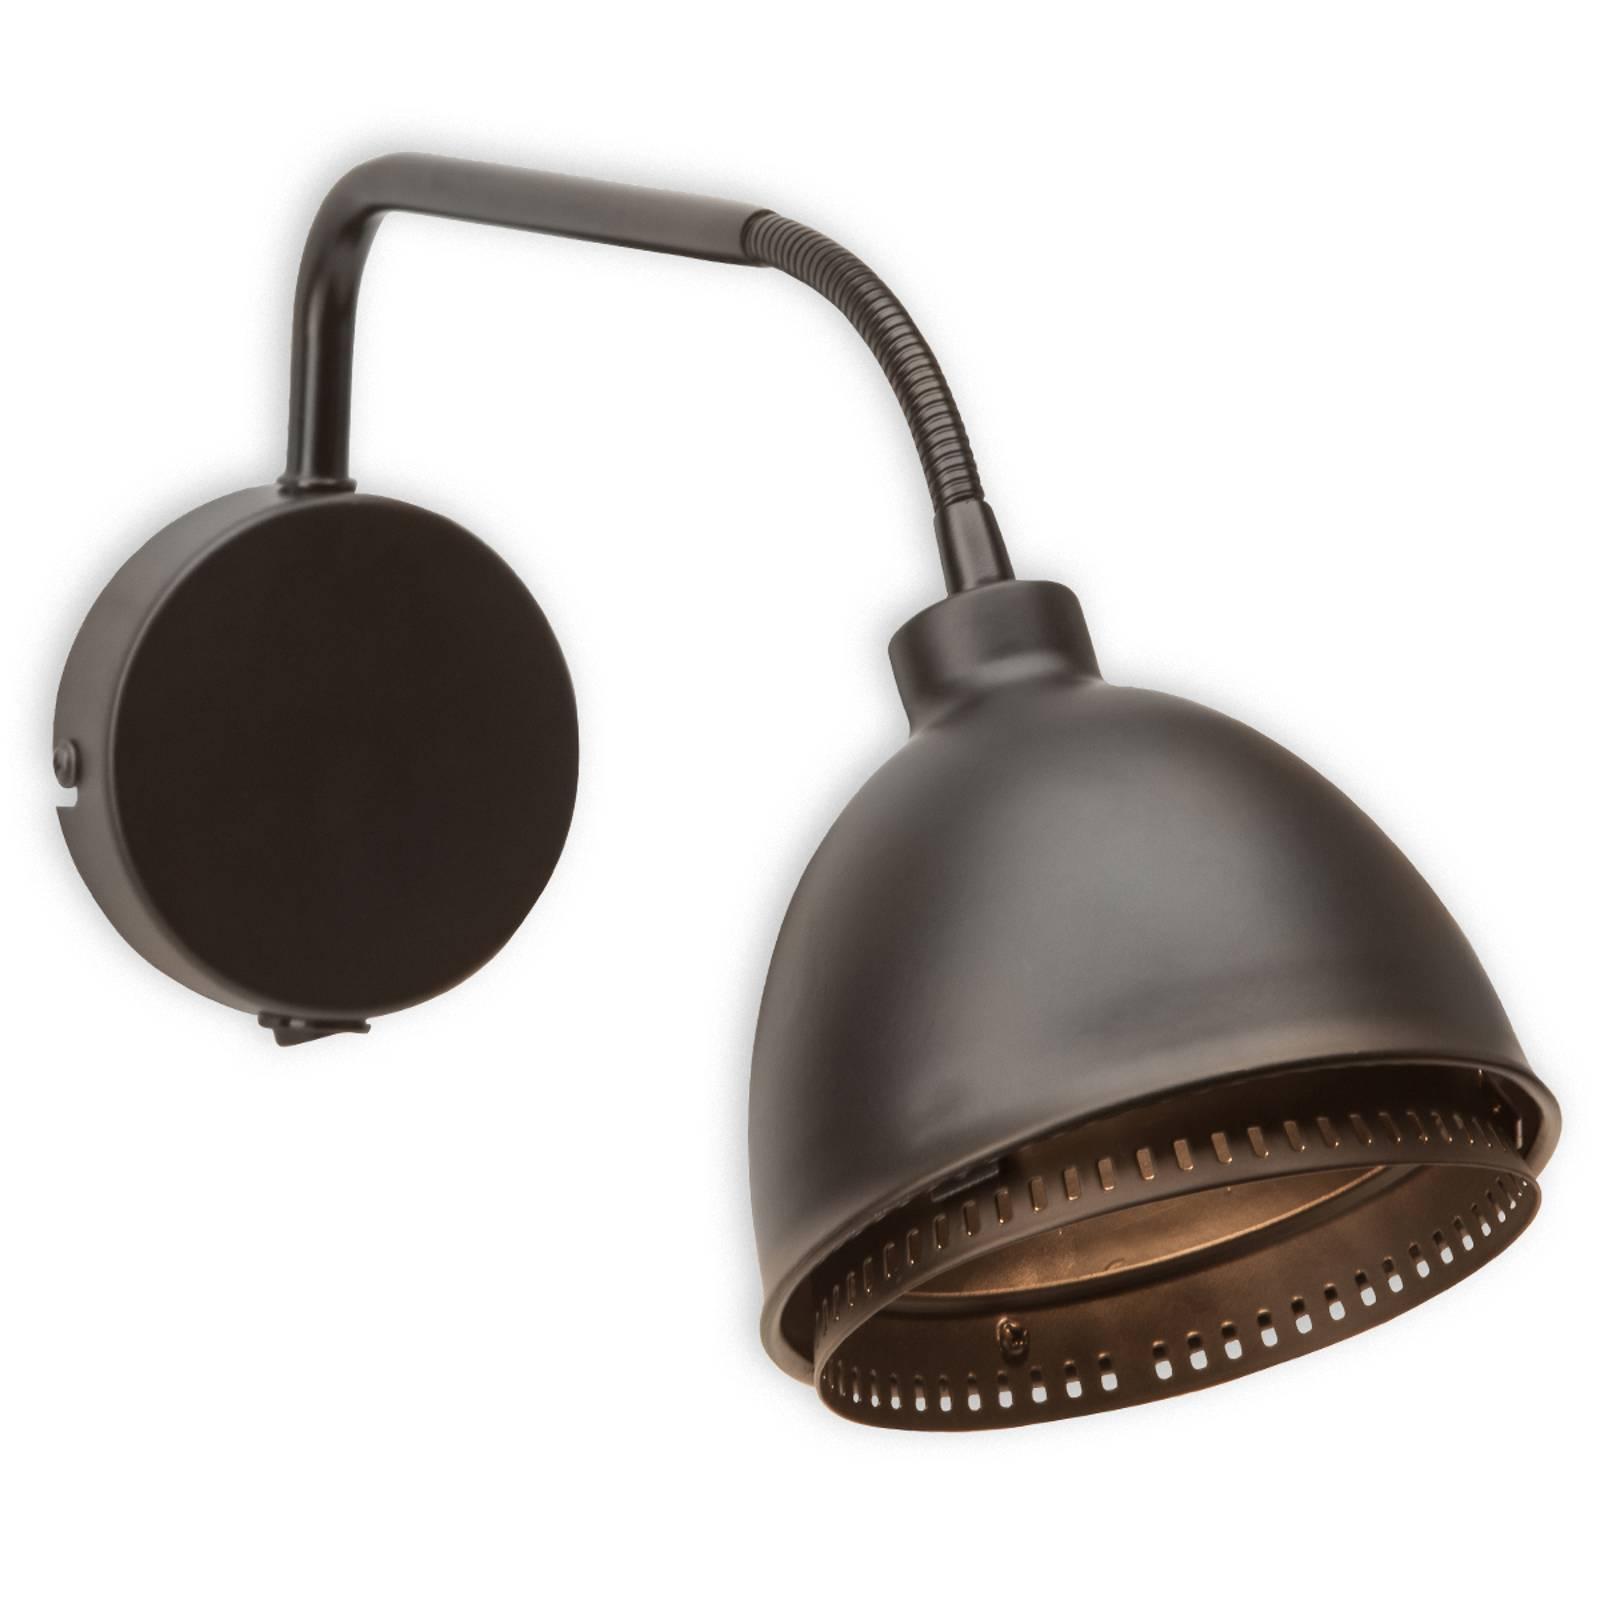 Skirt - zwarte wandlamp in industrieel design